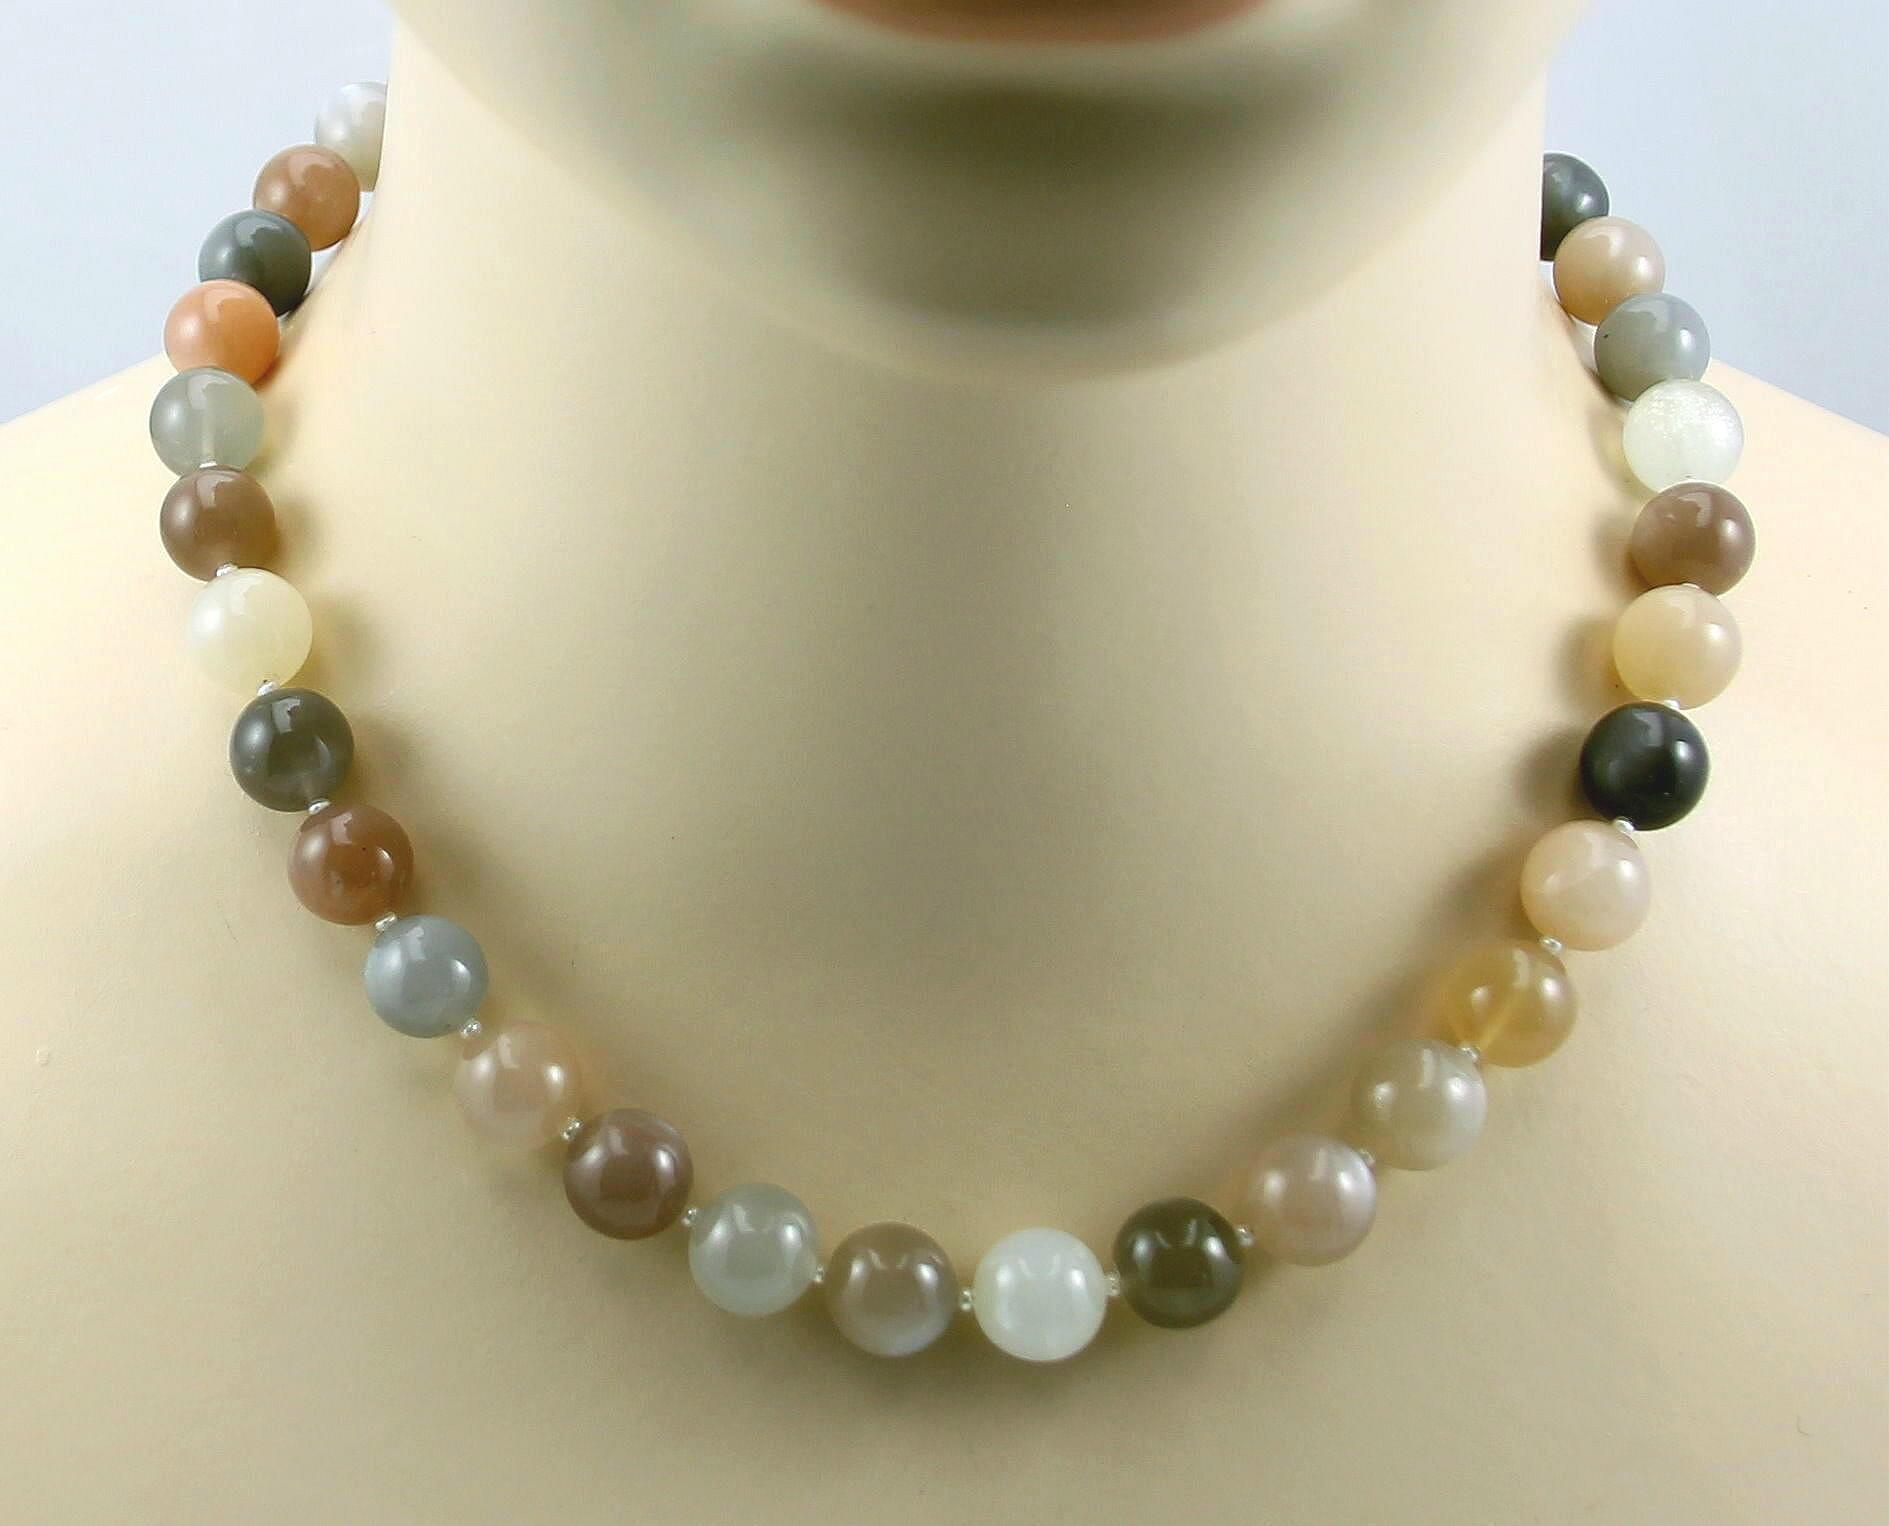 mondstein kette multicolour mit perle 46 5 cm lang in edelsteinketten. Black Bedroom Furniture Sets. Home Design Ideas